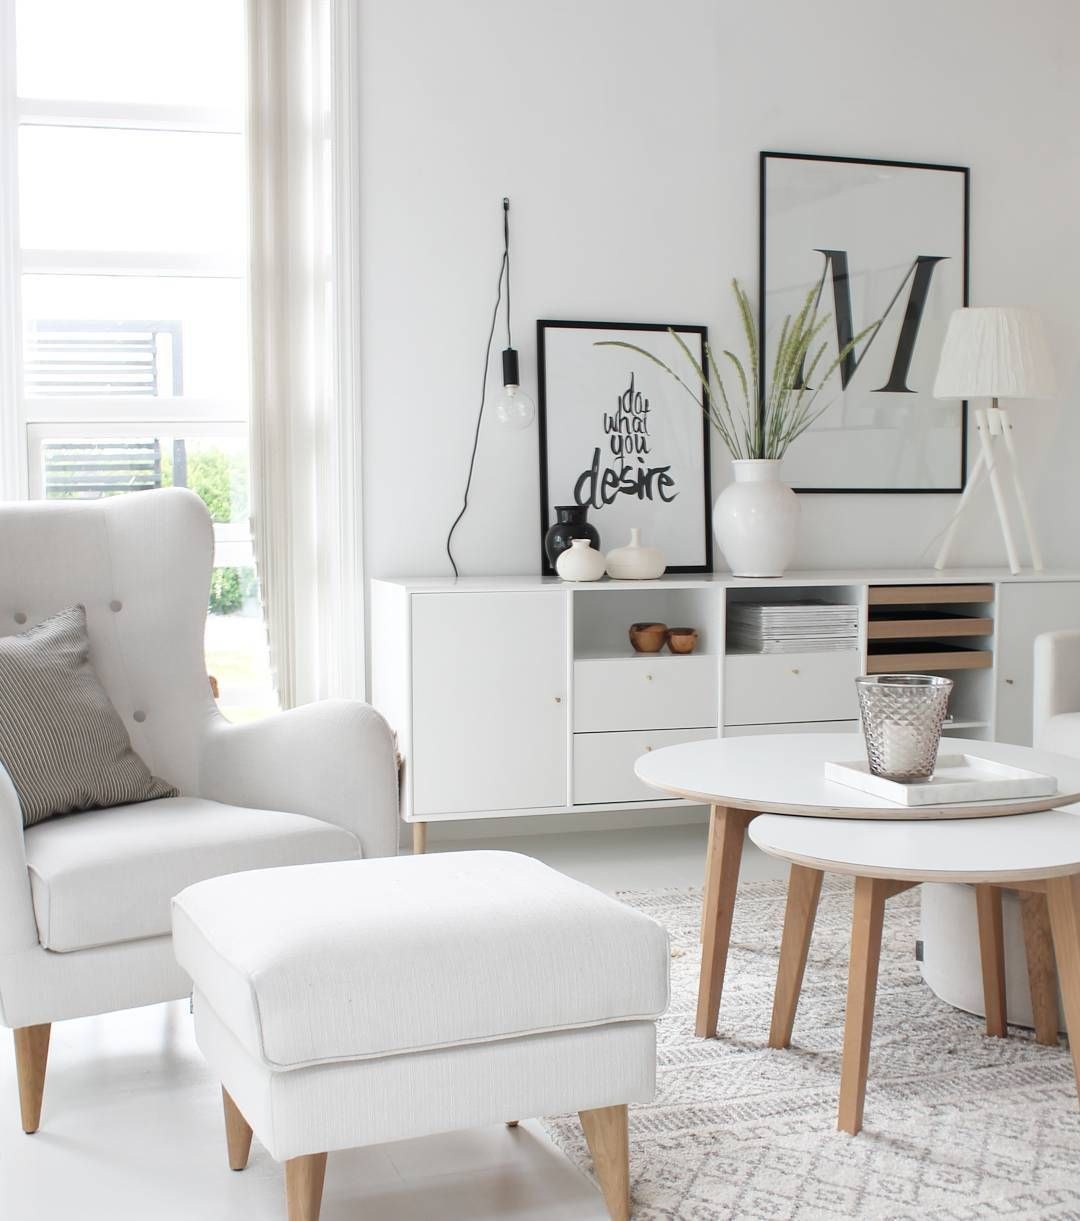 Scandinavian Living Room Design Ideas Inspiration: @rhiansworld On Pinterest Hellorhian On Insta